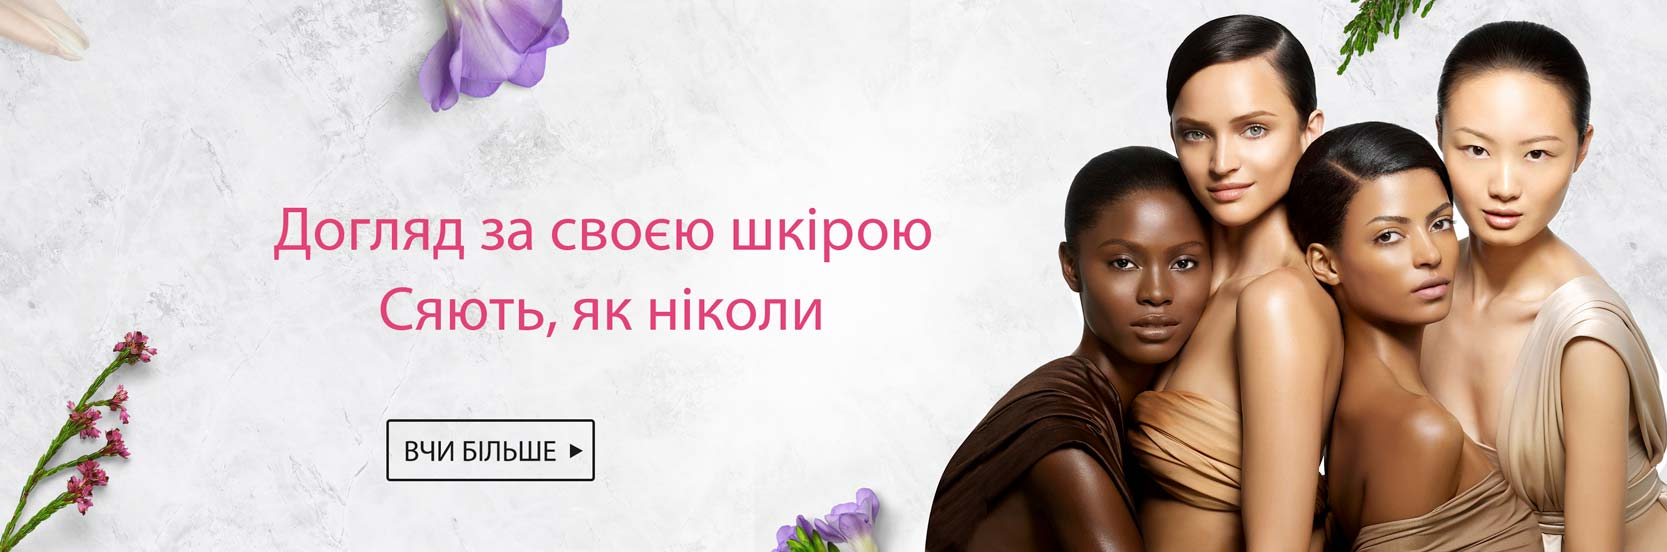 home banner 4 Skin Care Uk